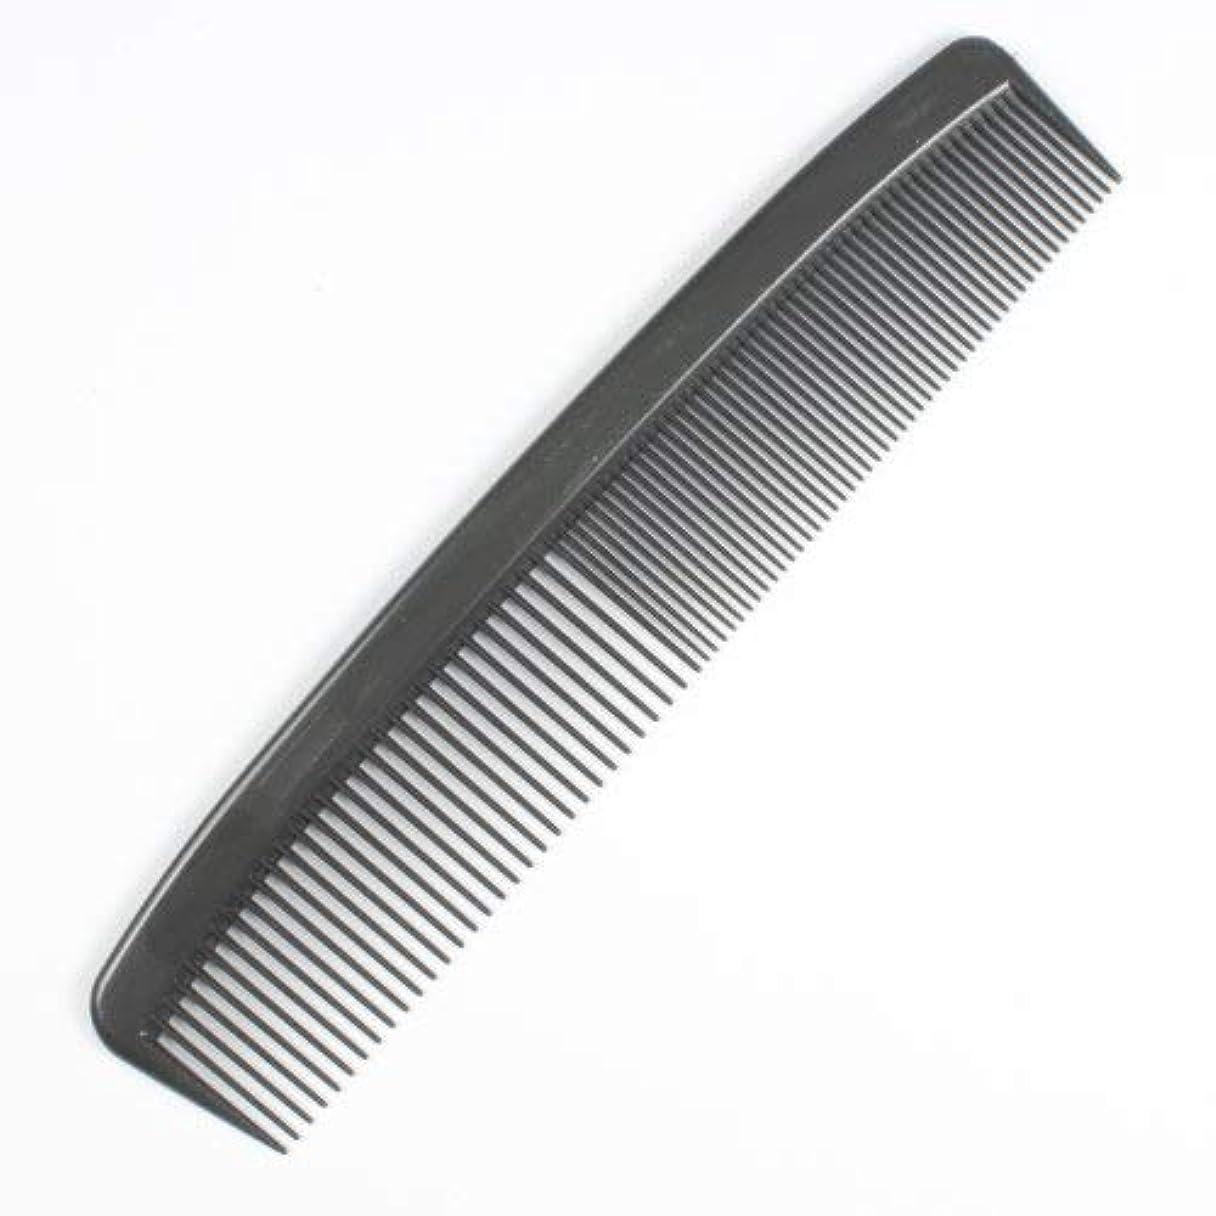 日食不完全人工的なDynarex Adult Combs, 5 Inches, Black, 240 Count [並行輸入品]